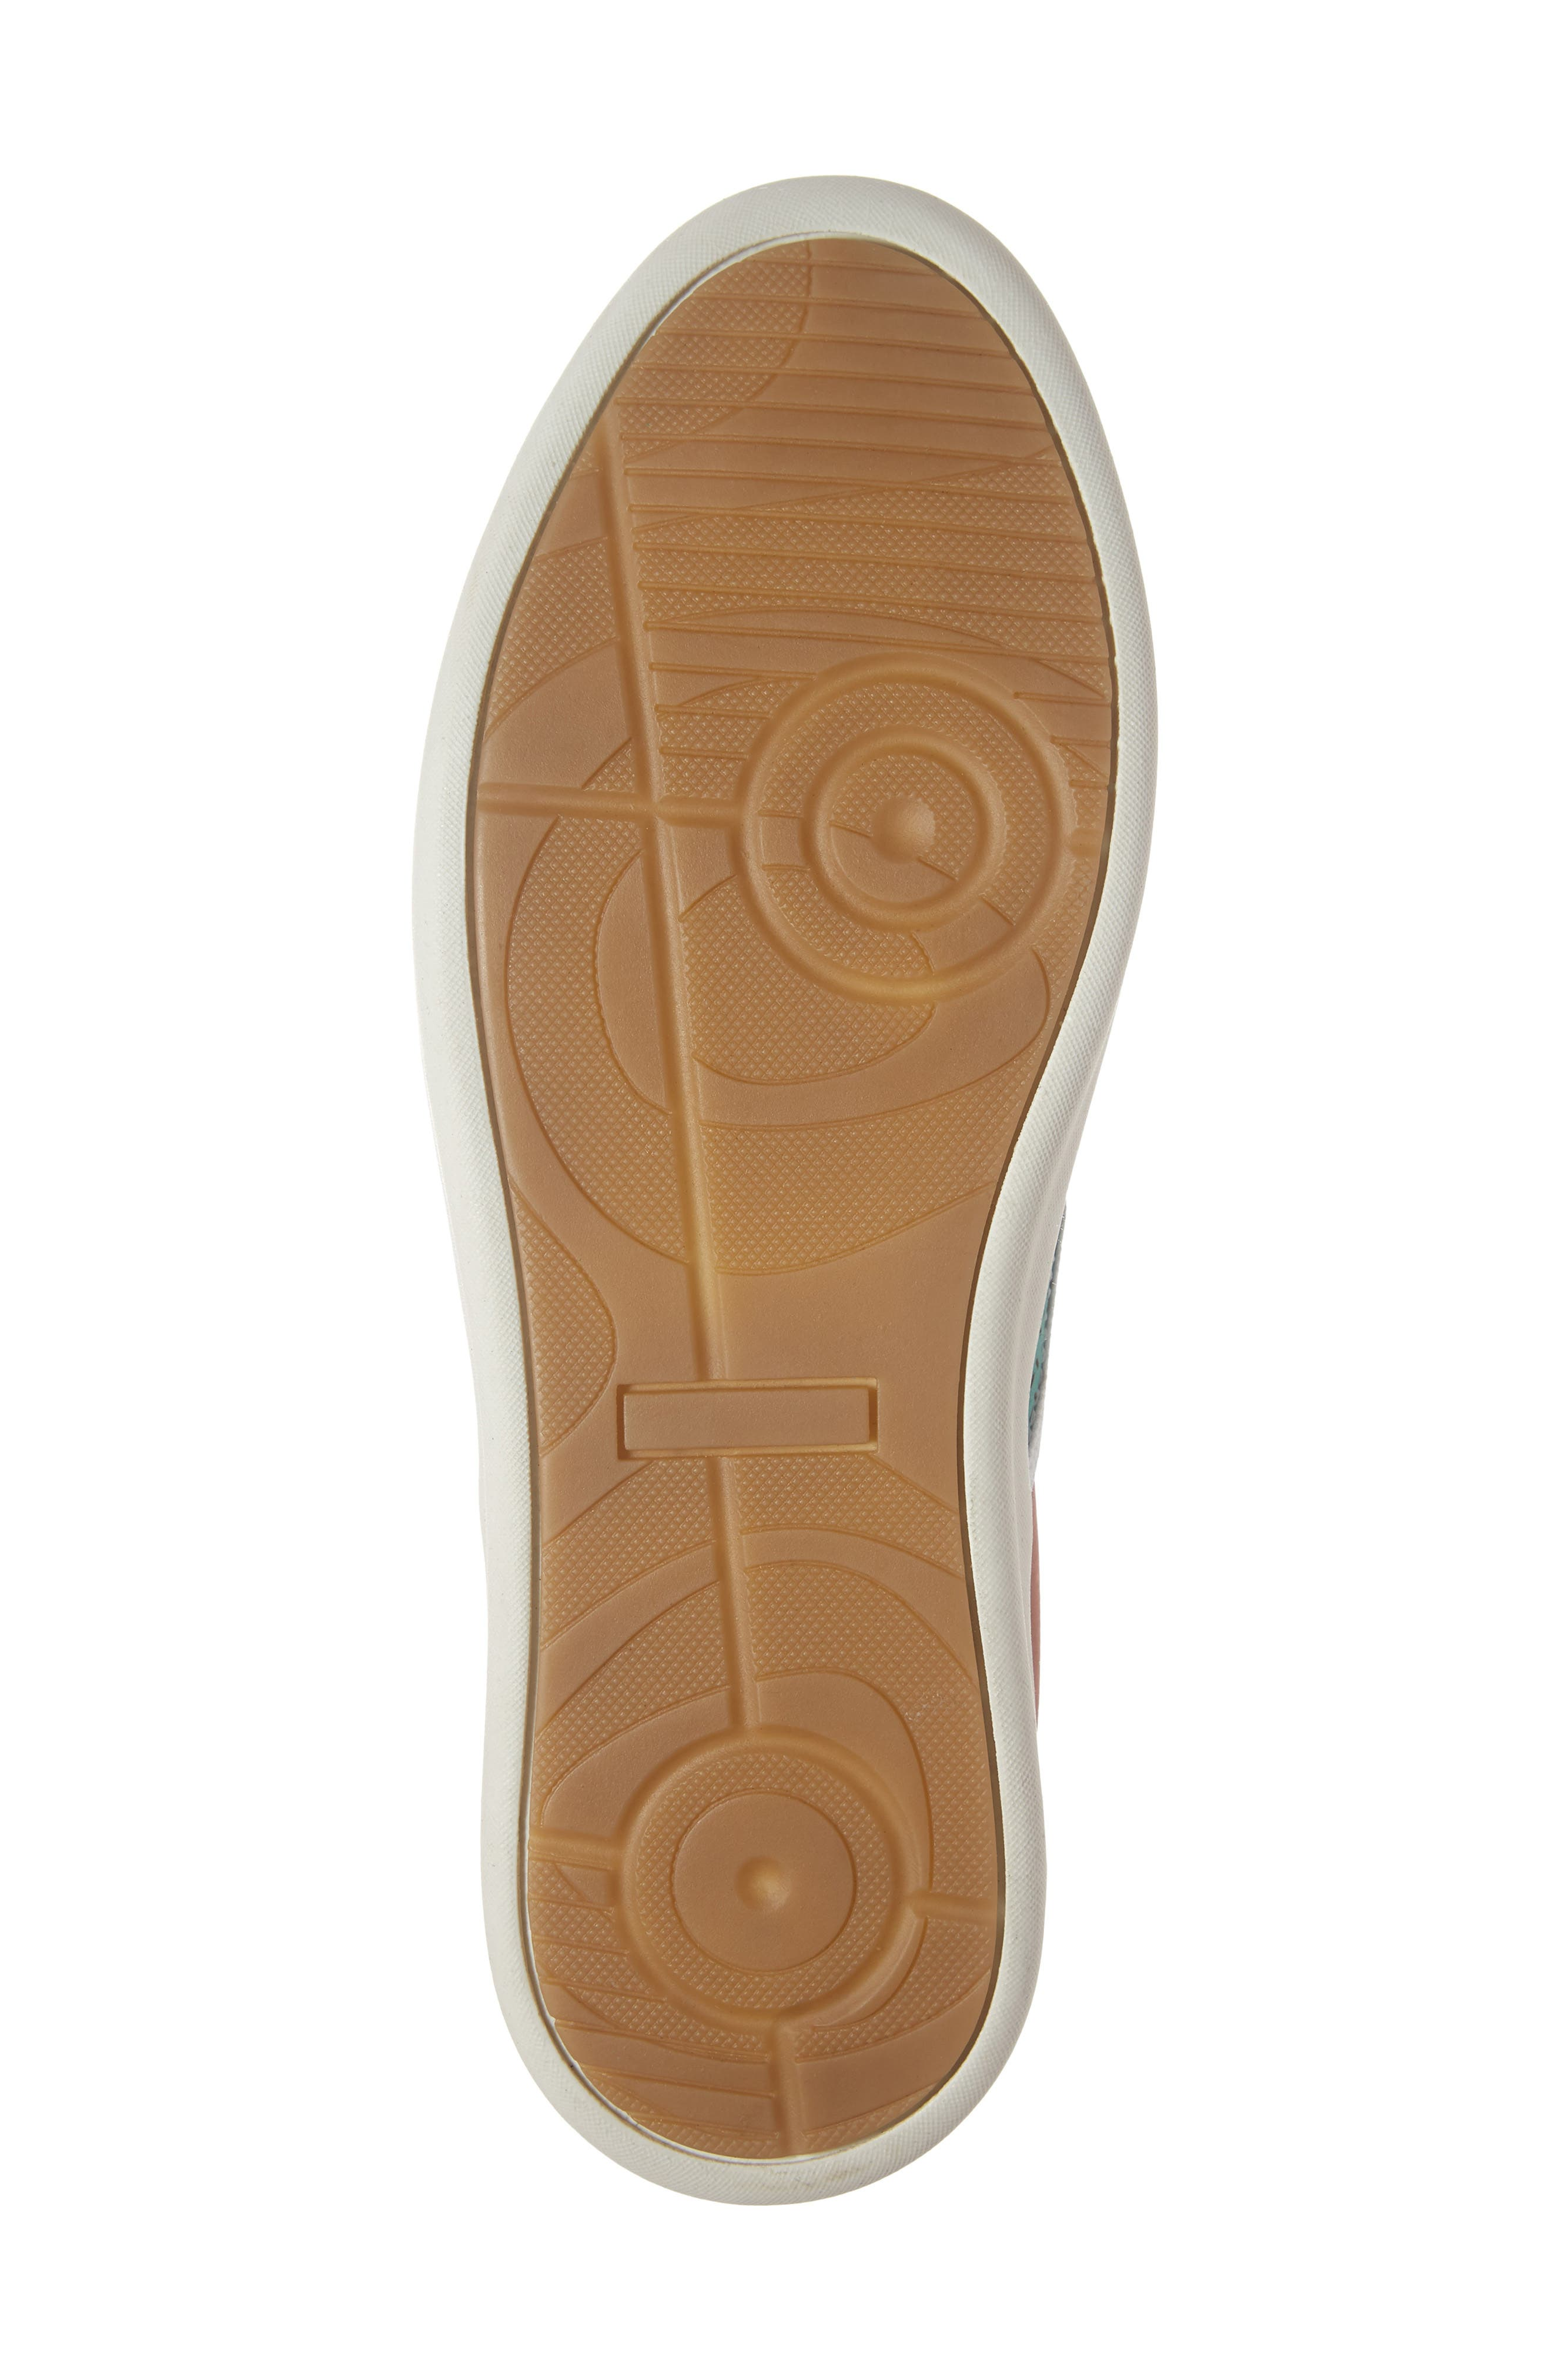 Malibu Perforated Loafer,                             Alternate thumbnail 6, color,                             AQUA/PINK NUBUCK